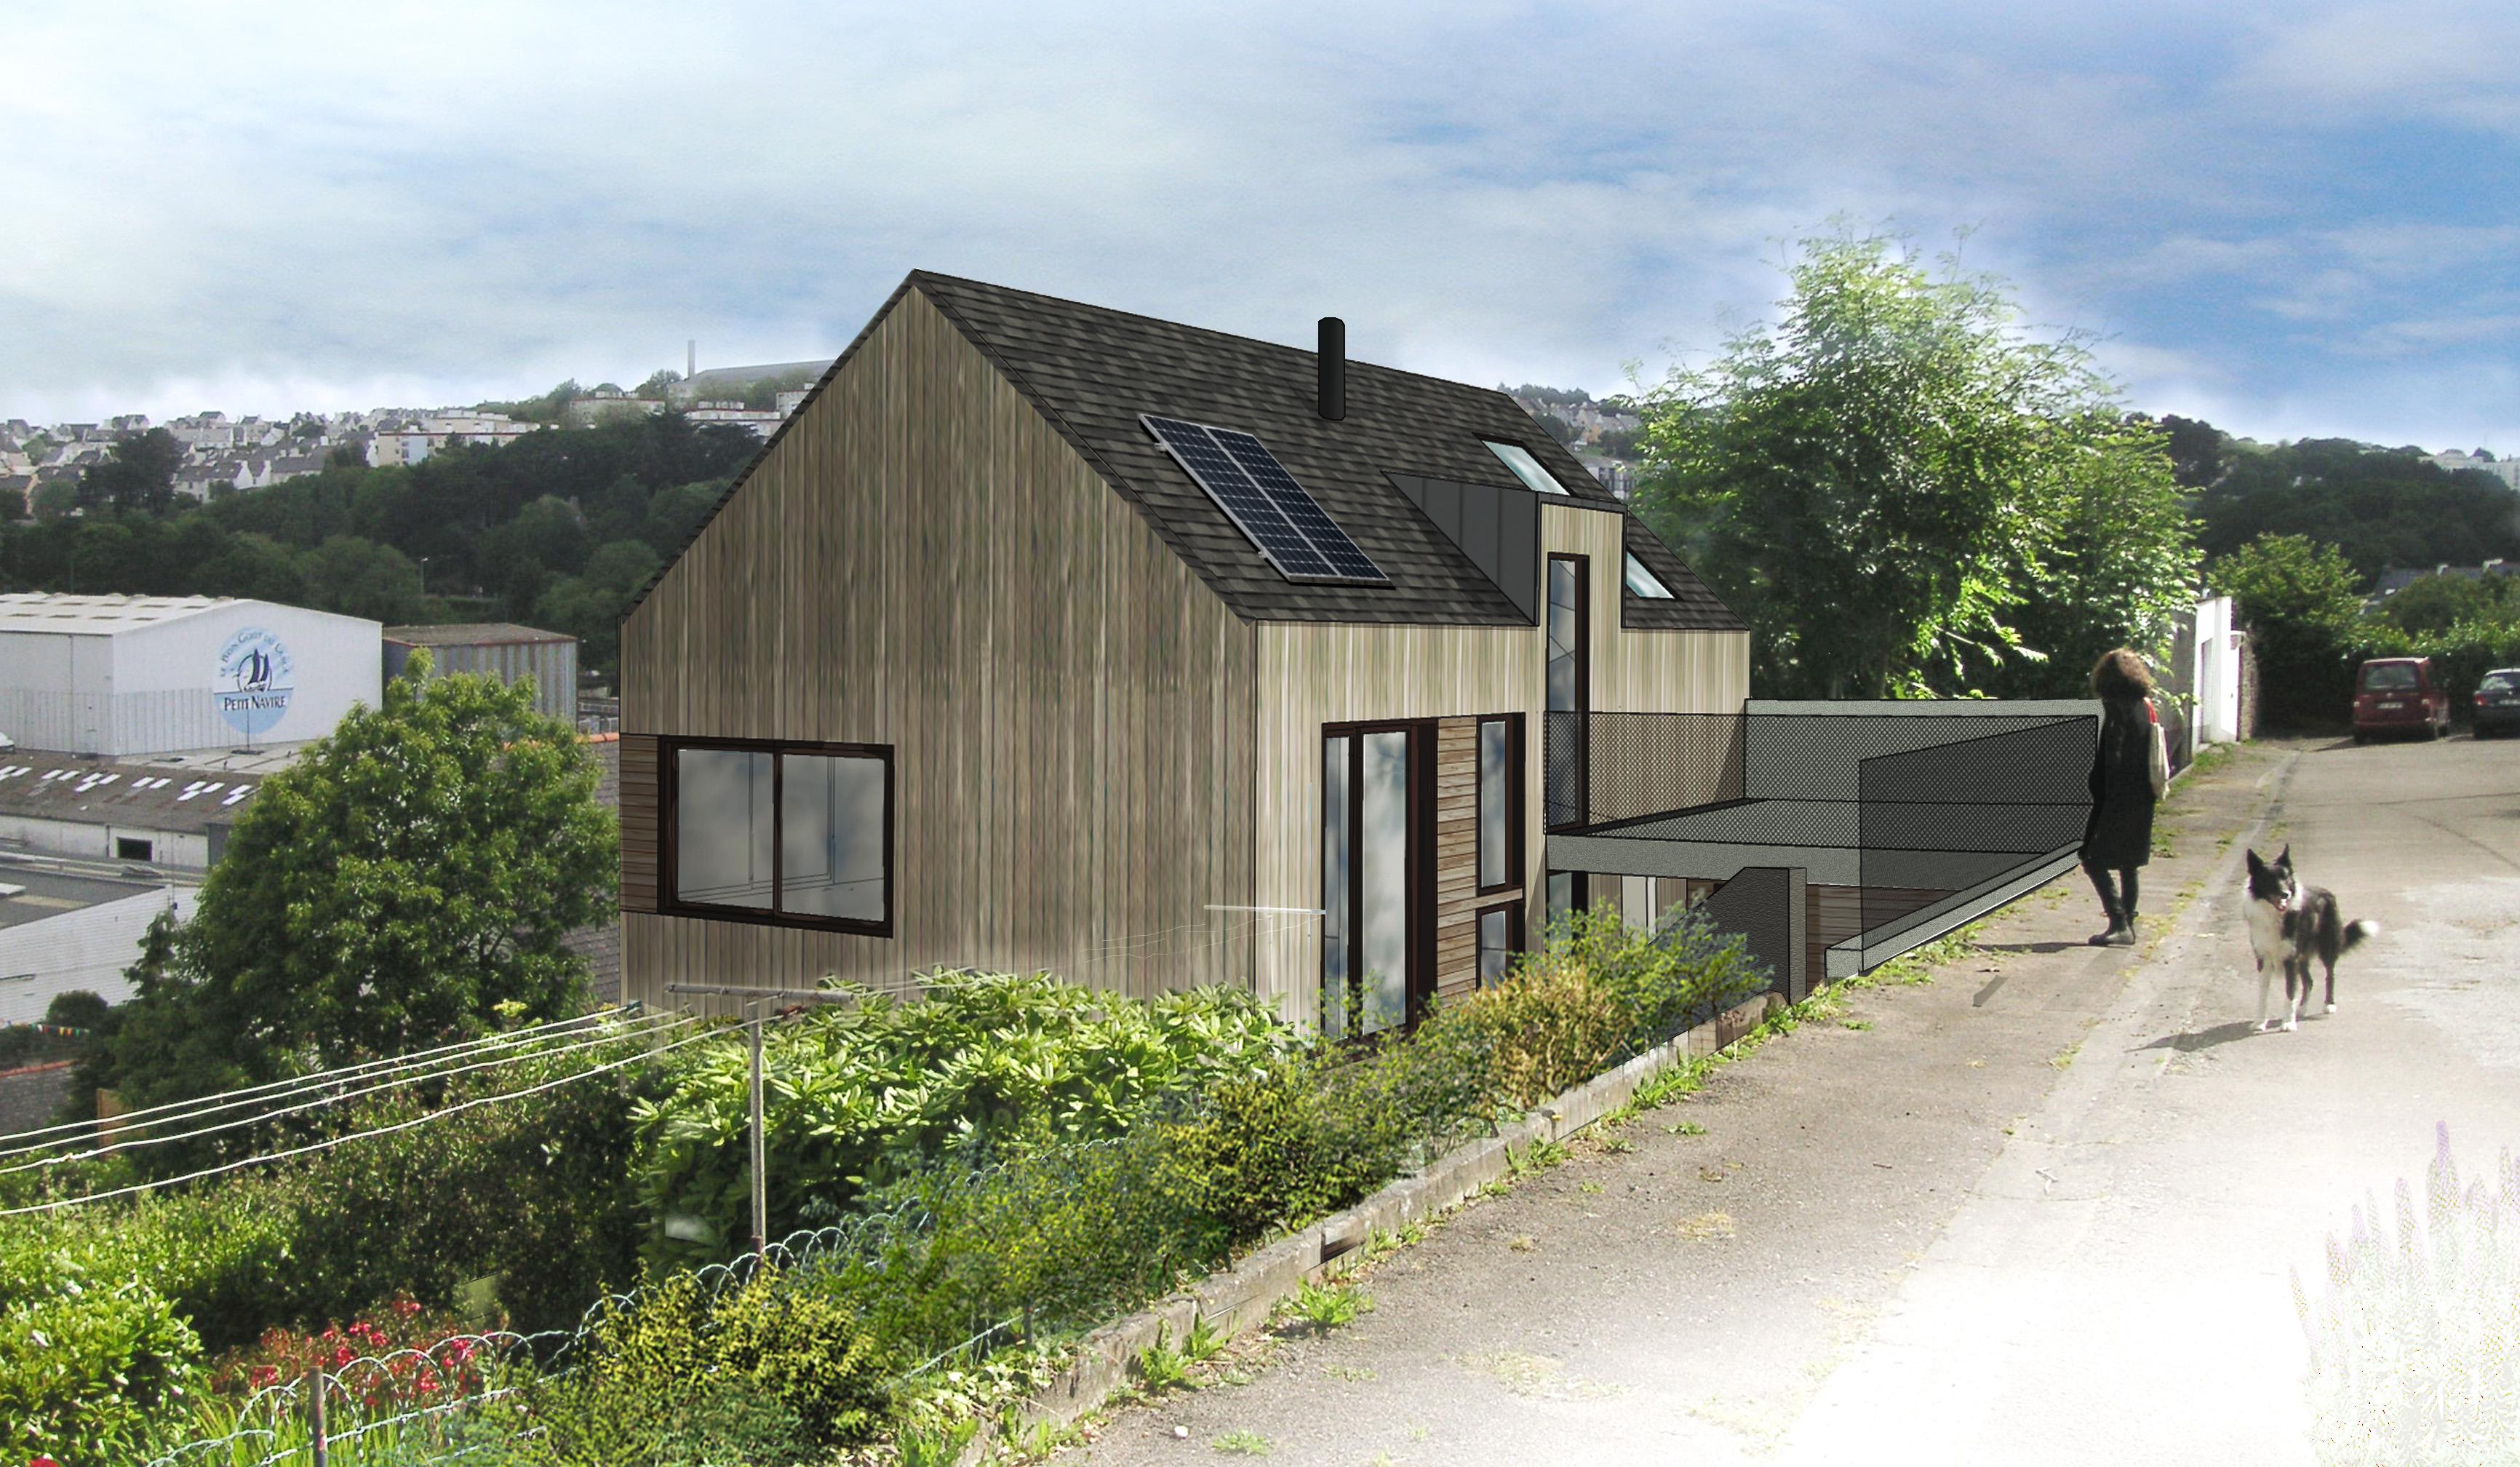 tyerra architectes architecture habitat sain finist re. Black Bedroom Furniture Sets. Home Design Ideas